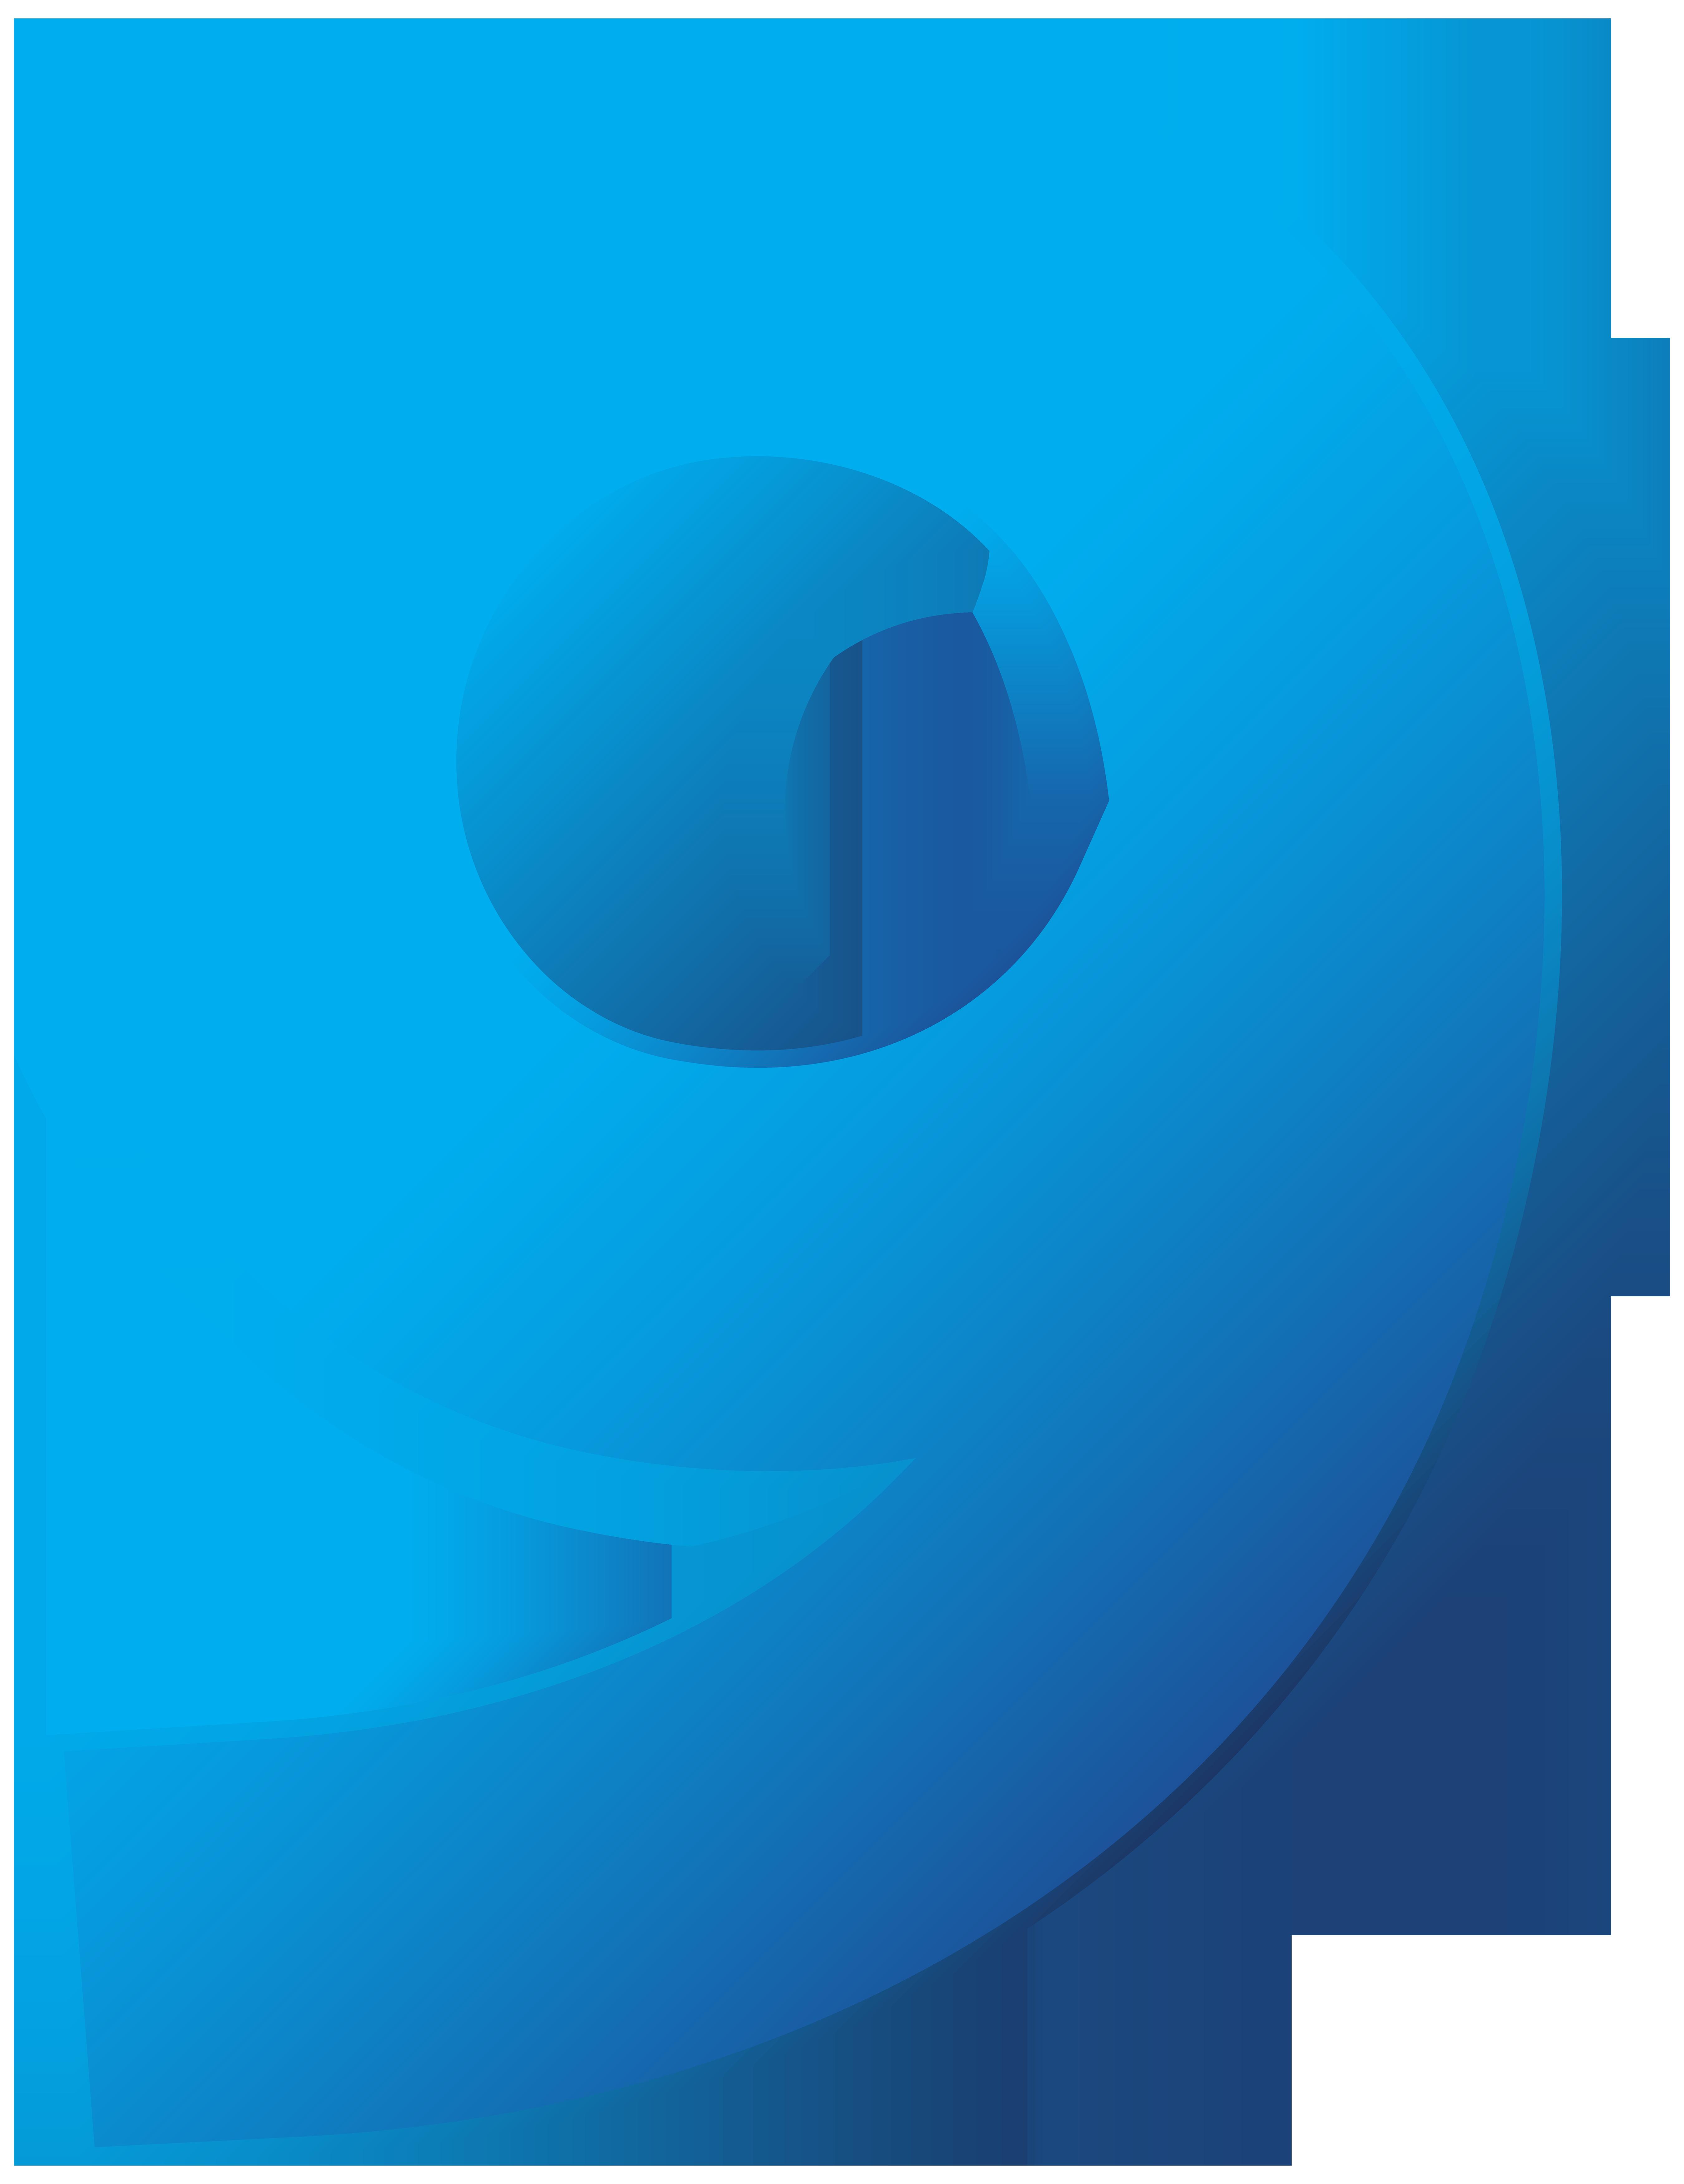 Number 6 clipart blue, Number 6 blue Transparent FREE for.